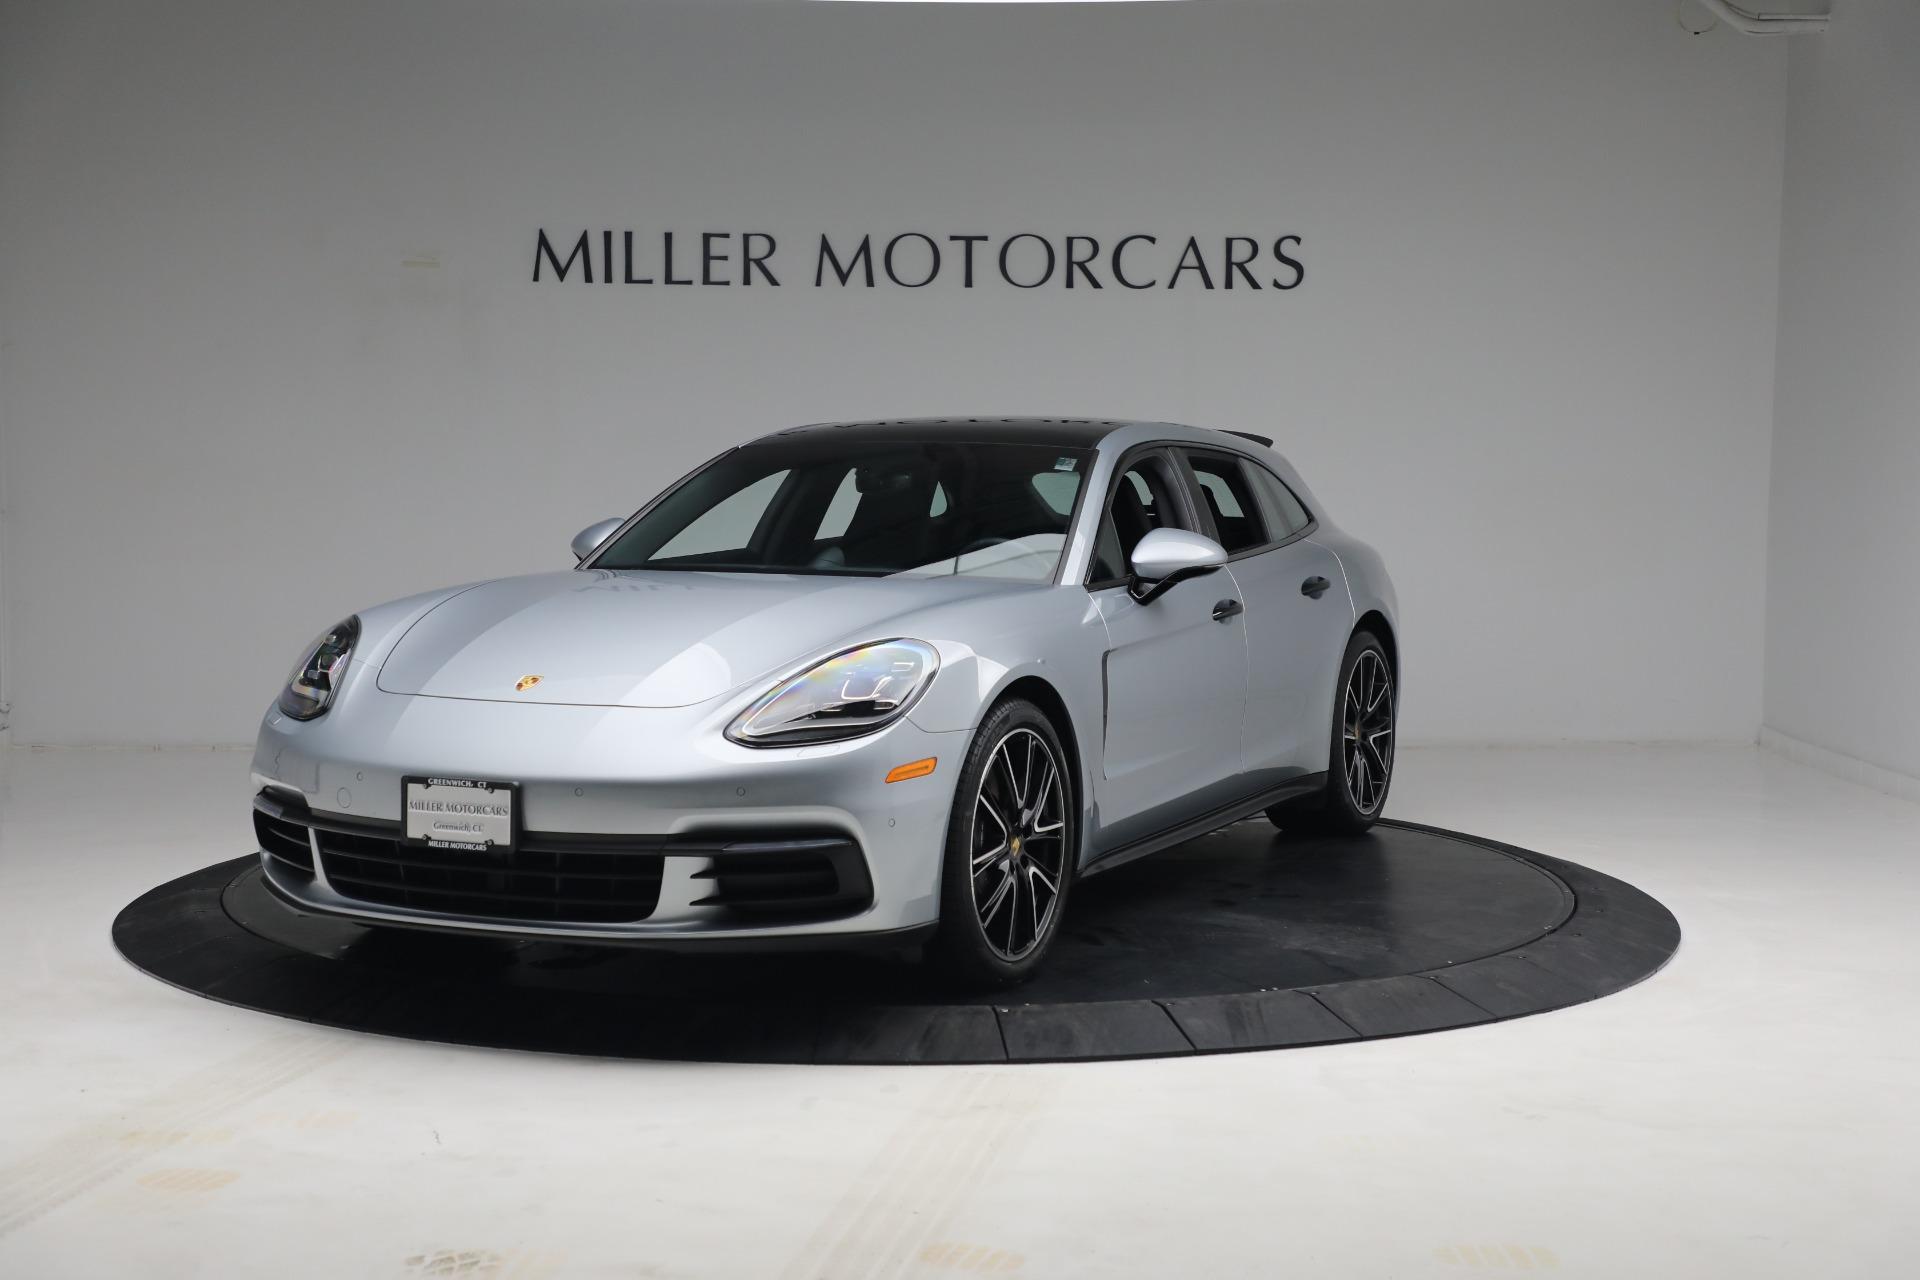 Used 2018 Porsche Panamera 4 Sport Turismo for sale $97,900 at Aston Martin of Greenwich in Greenwich CT 06830 1